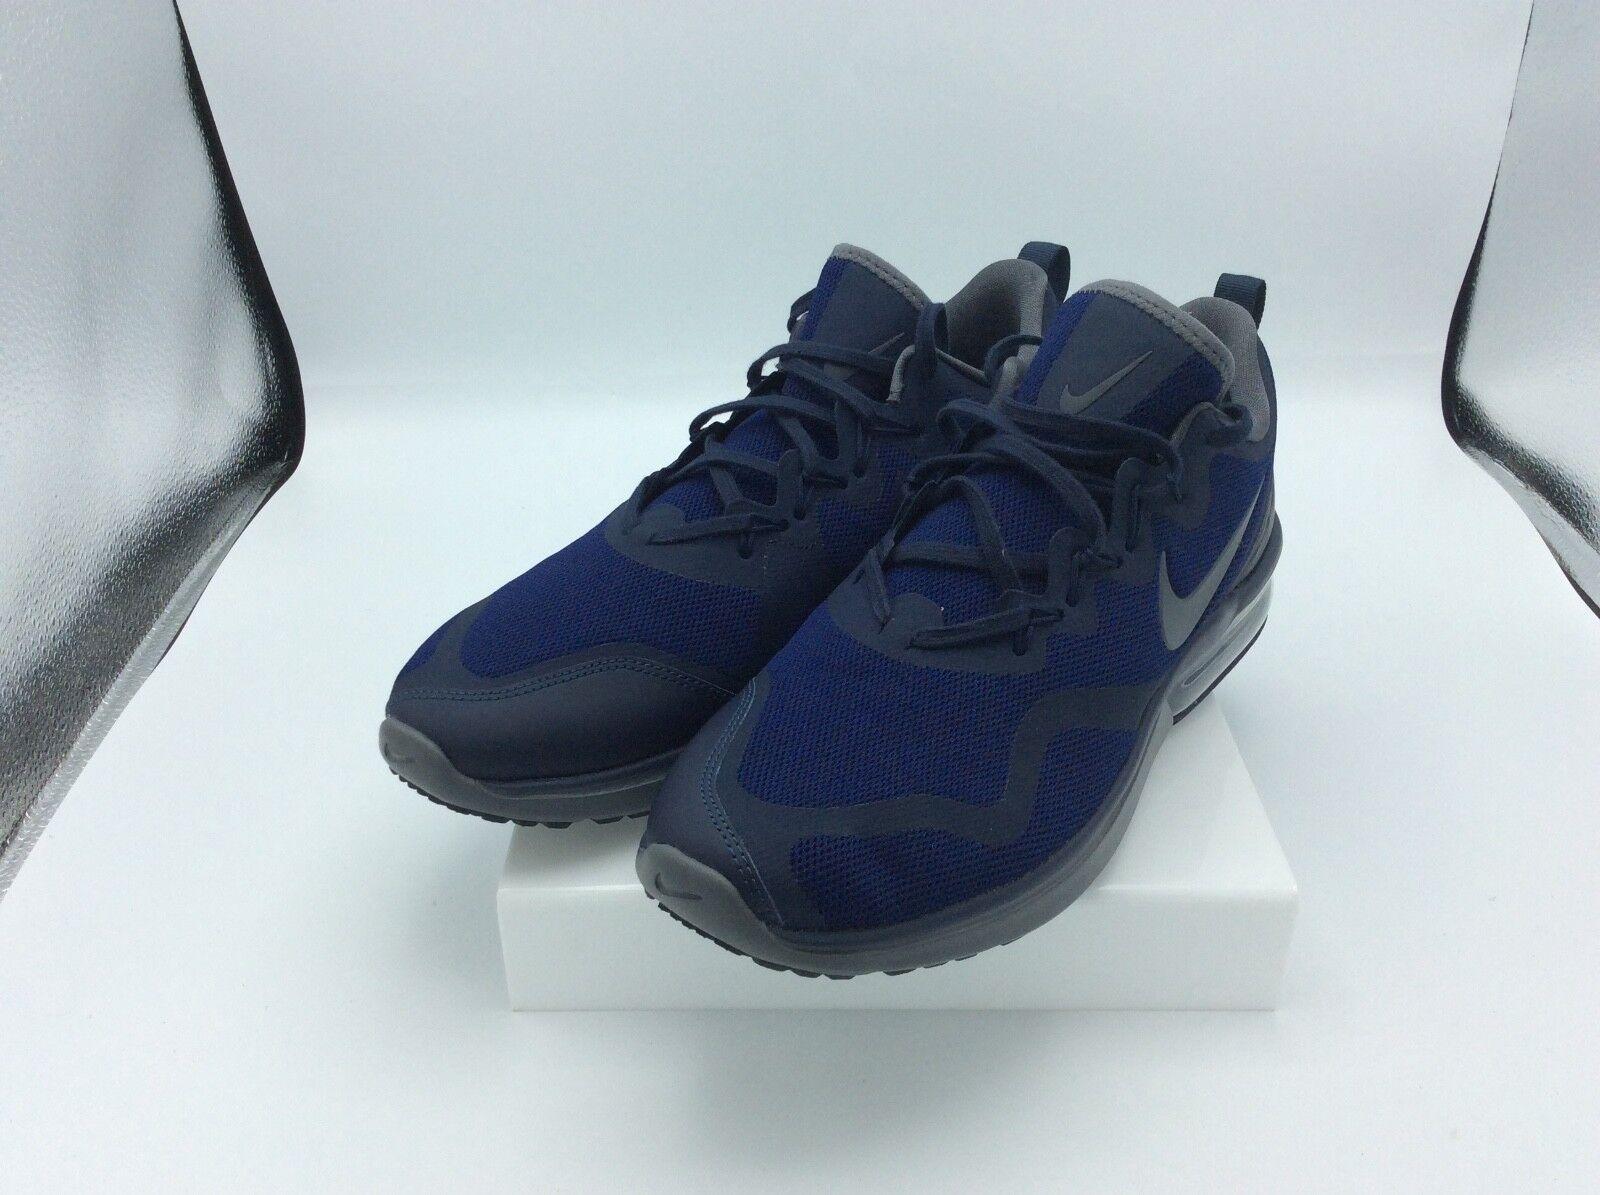 Nike Men's Air Max Fury Obsidian/Dark Gray Size 10 M